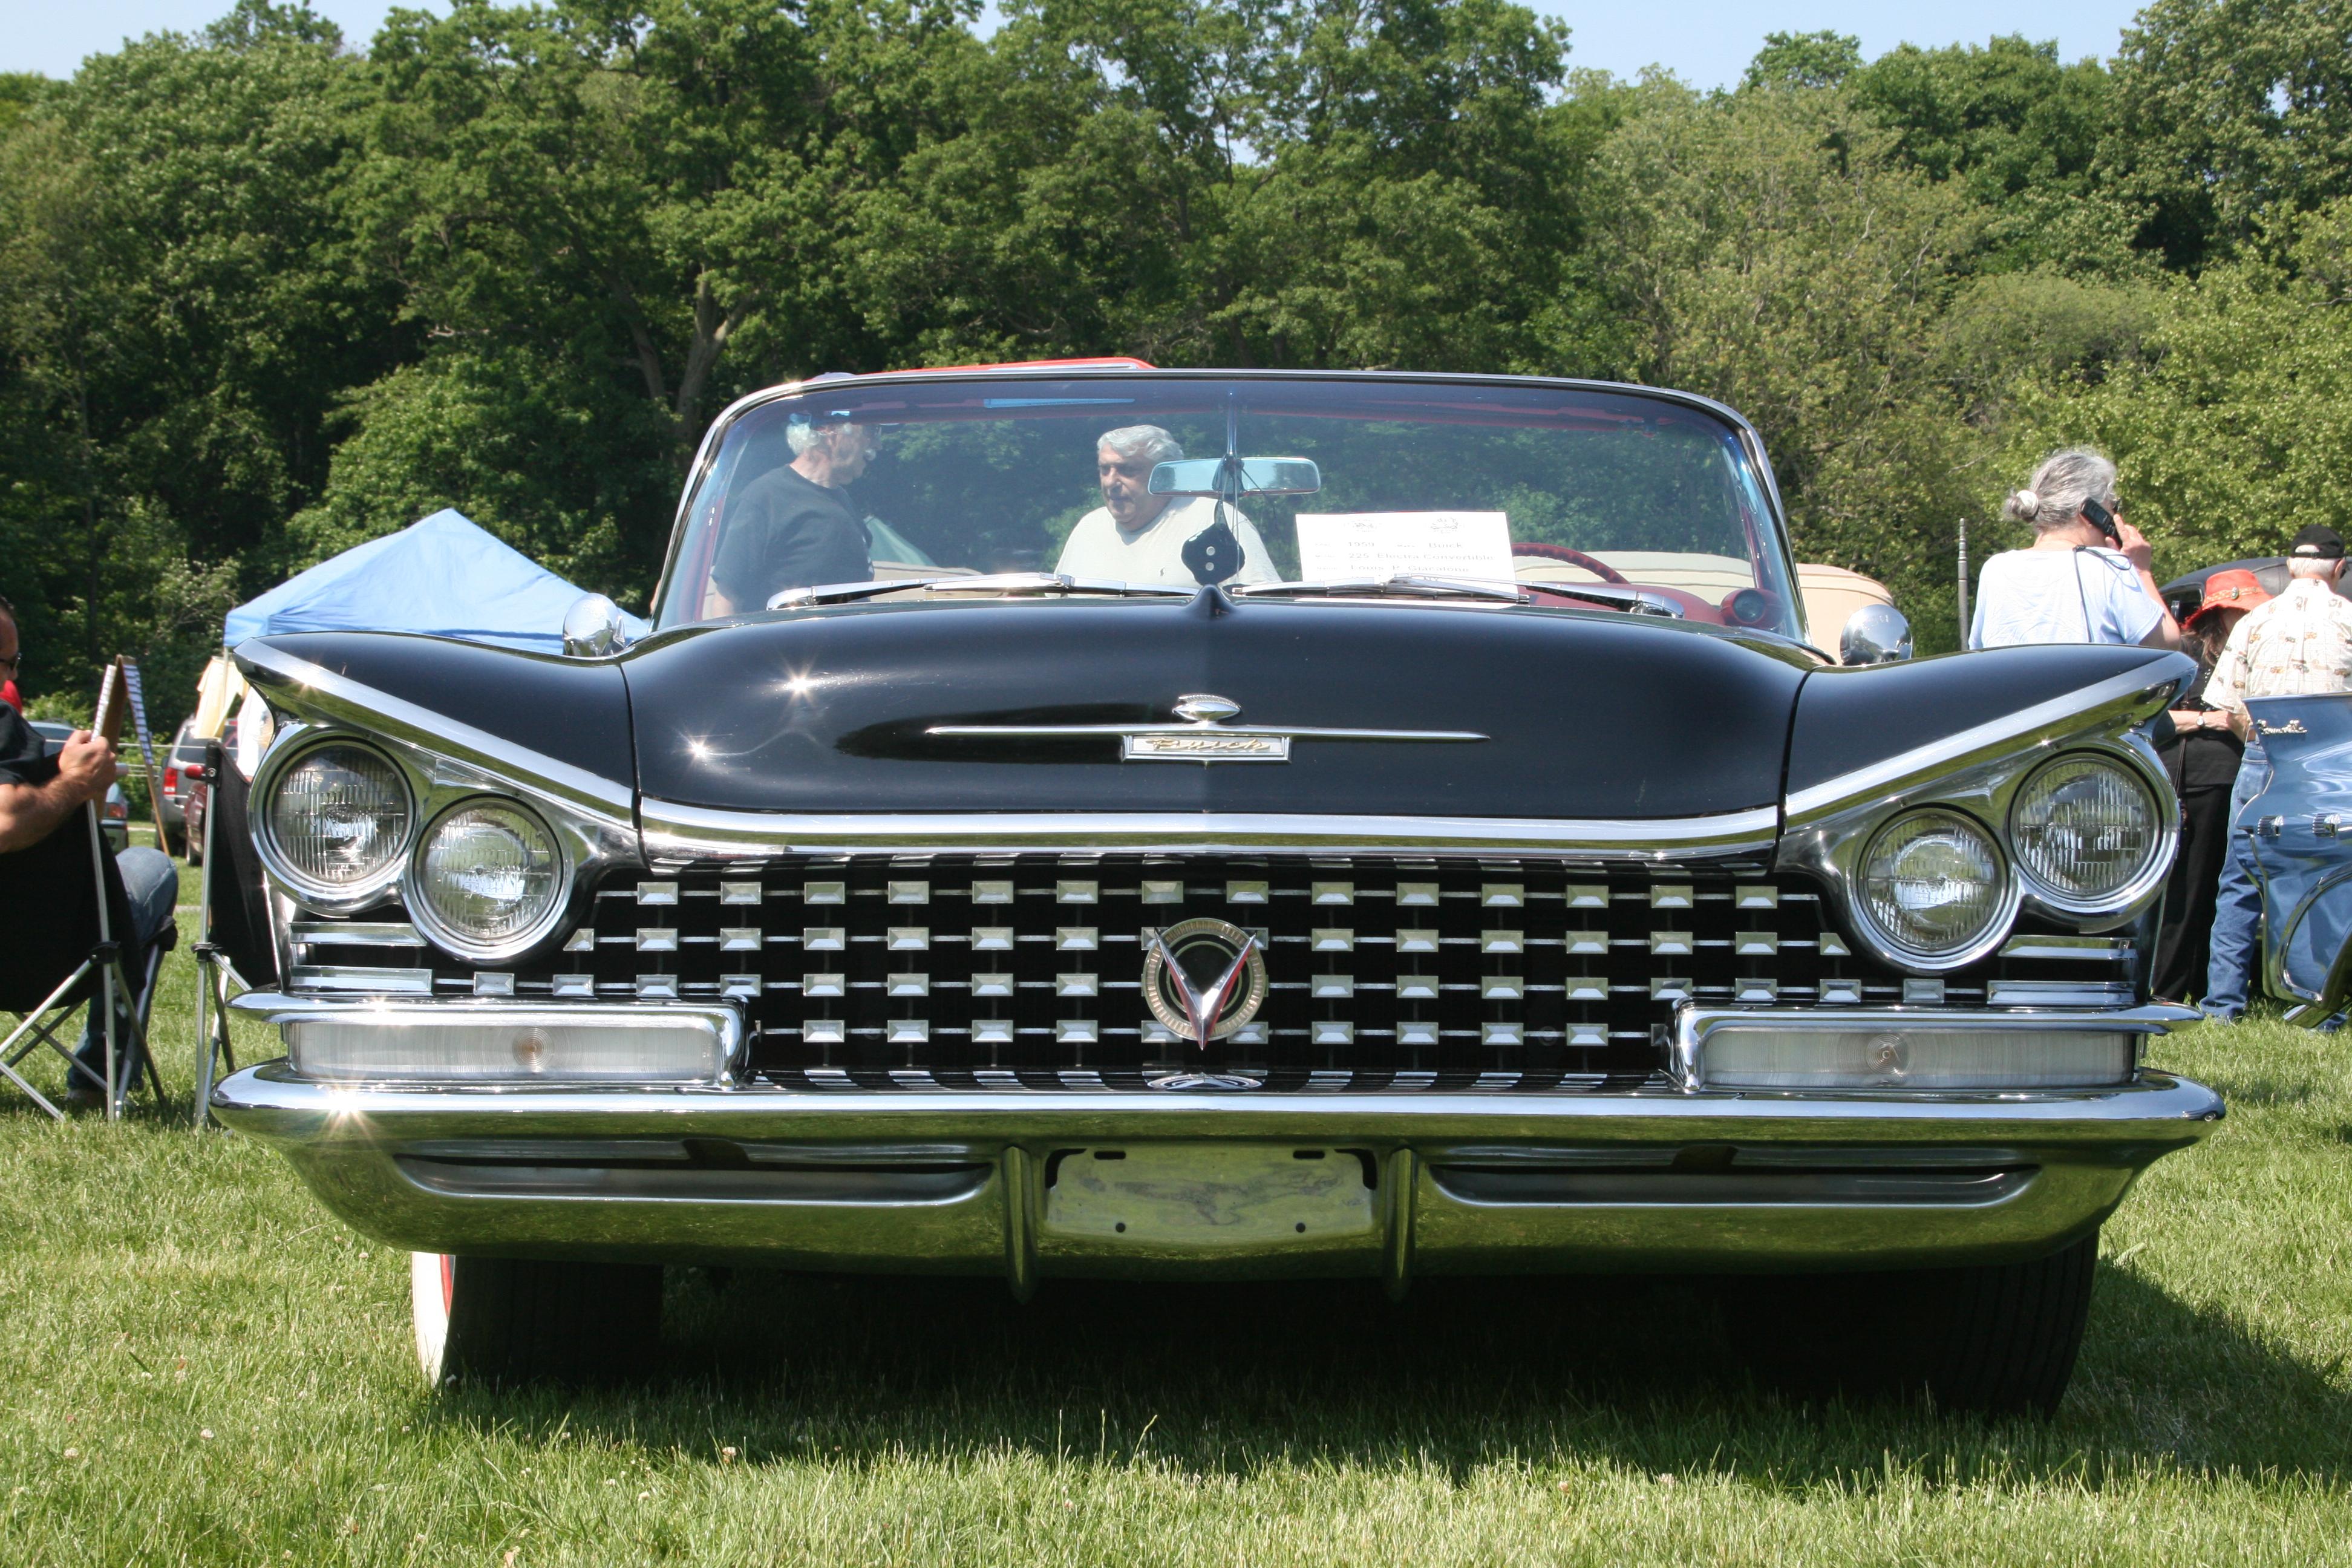 Buick Electra I 1959 - 1960 Cabriolet #2